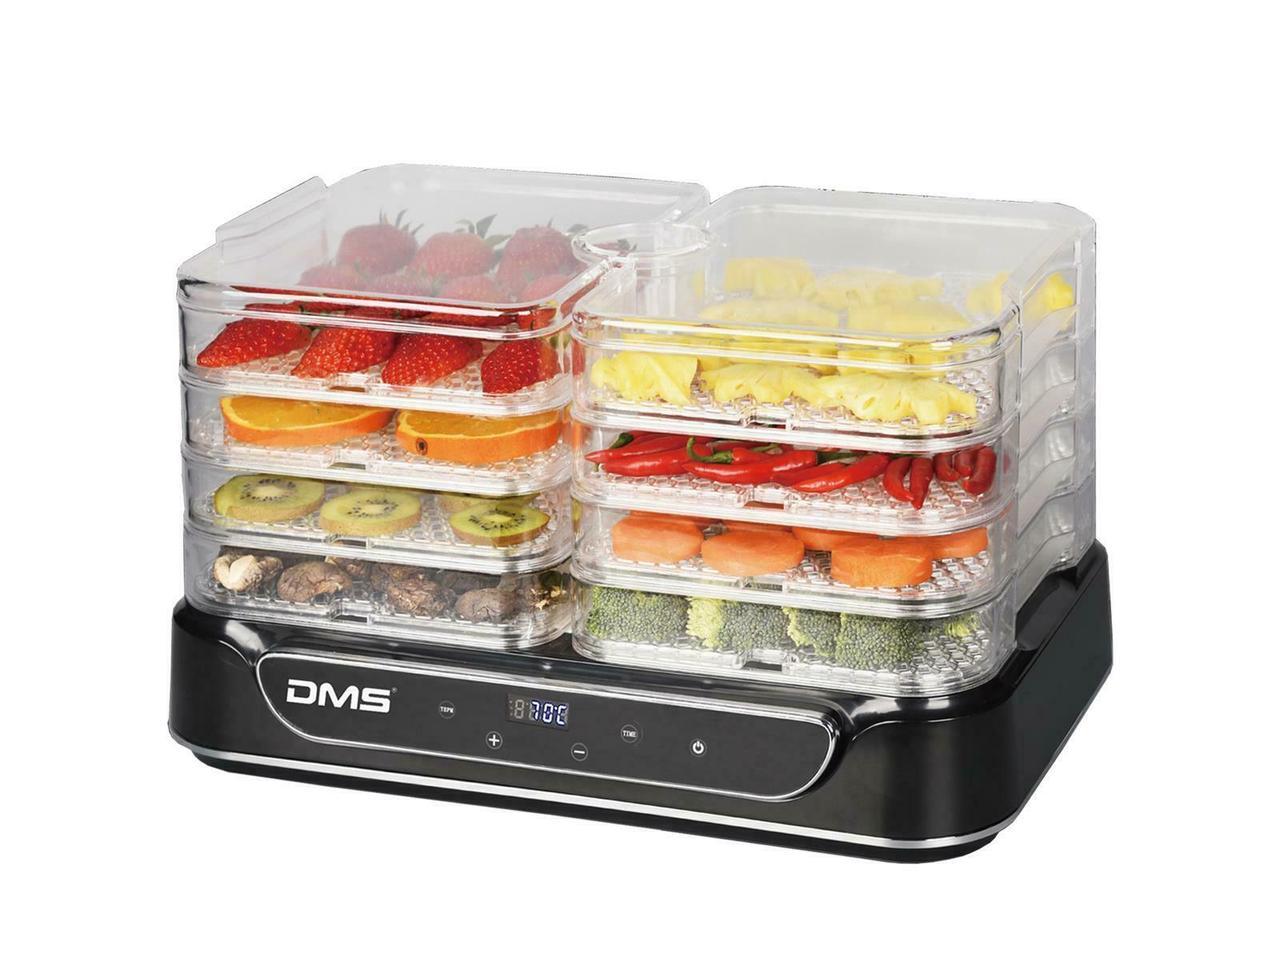 Сушилка для овощей и фруктов DMS da-02 550w